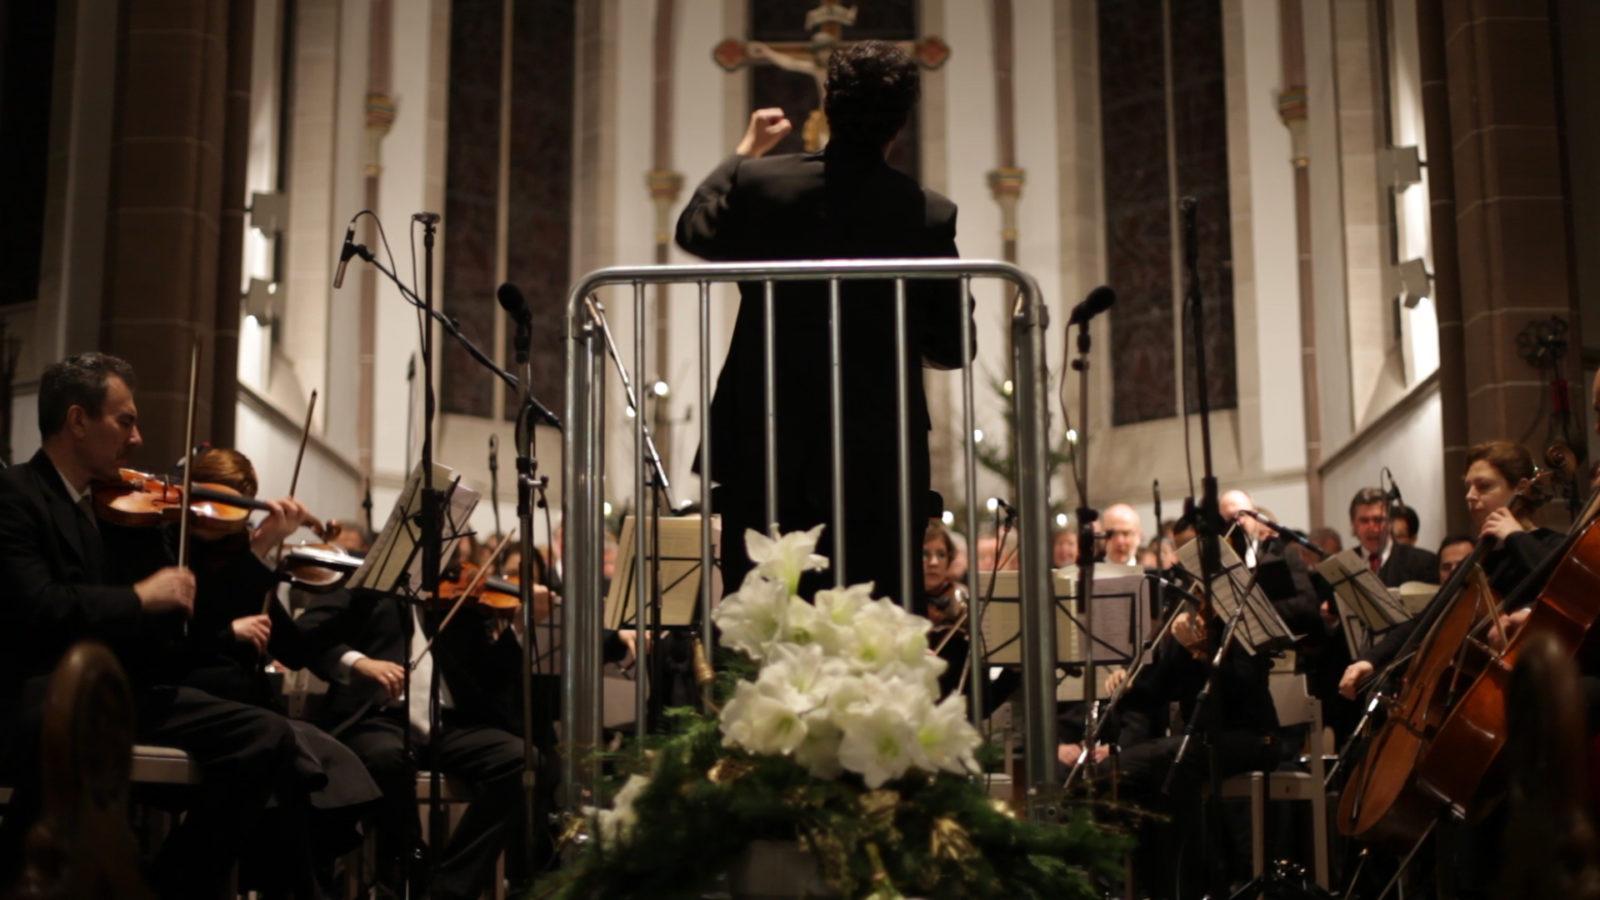 st. servatius kierberg brühl bühne kirche klassik